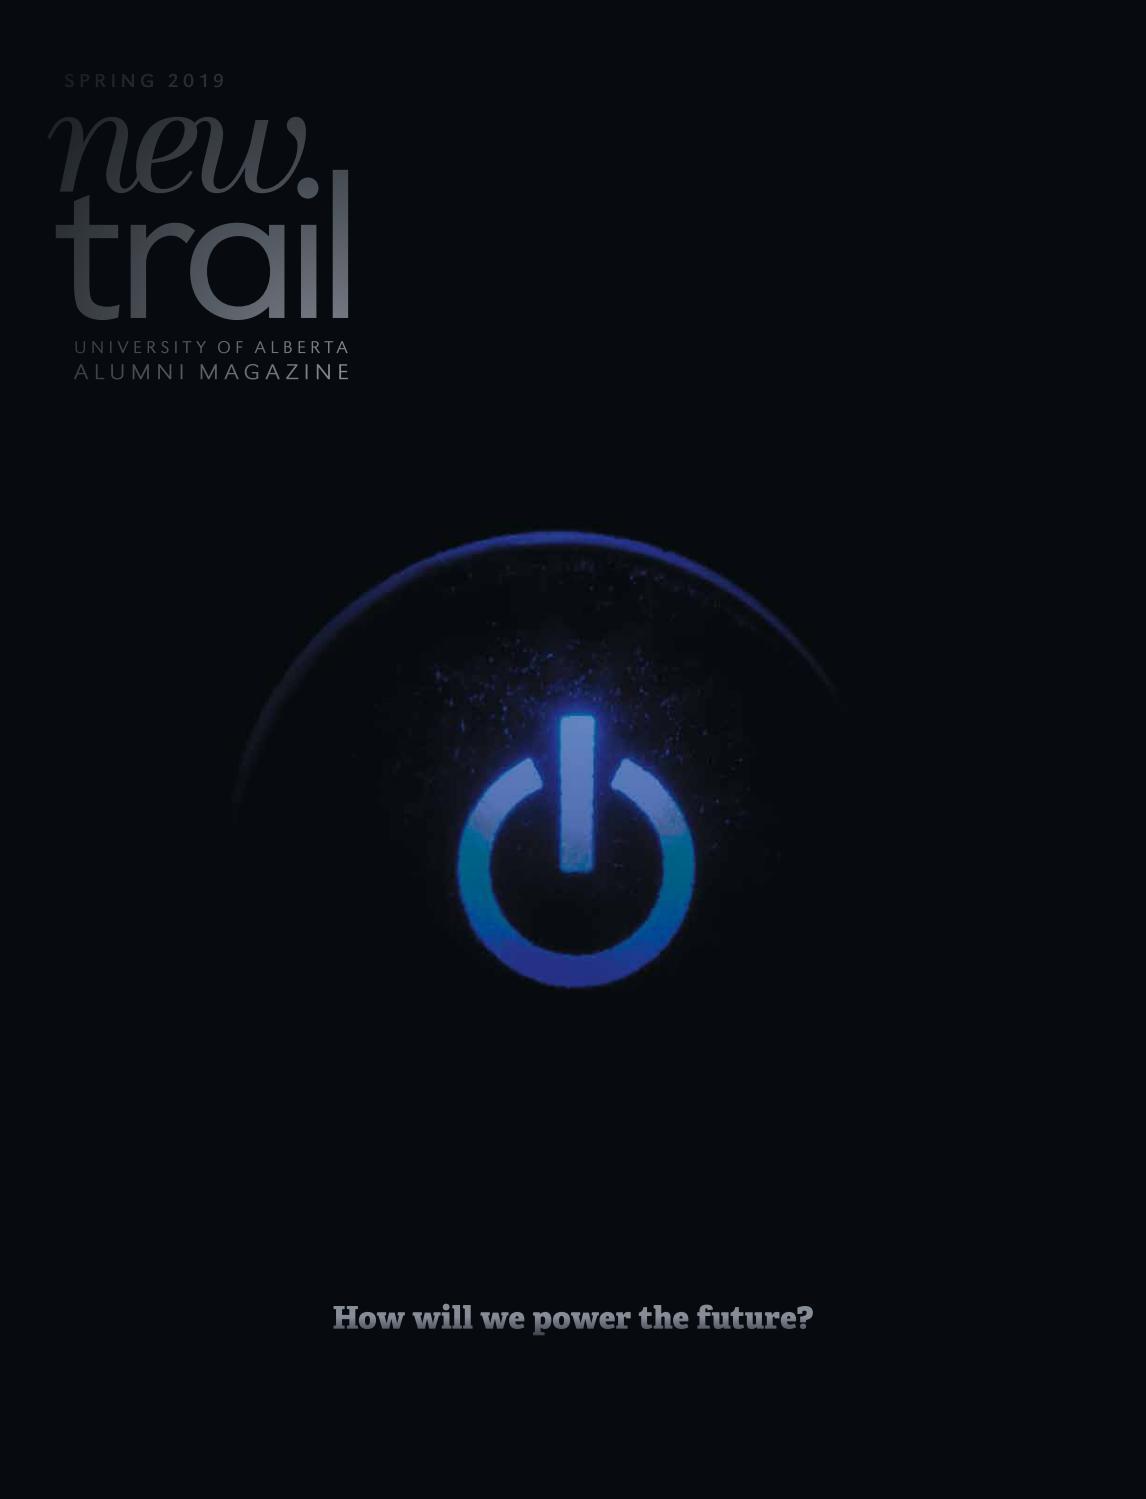 New Trail Spring 2019 by University of Alberta Alumni - issuu